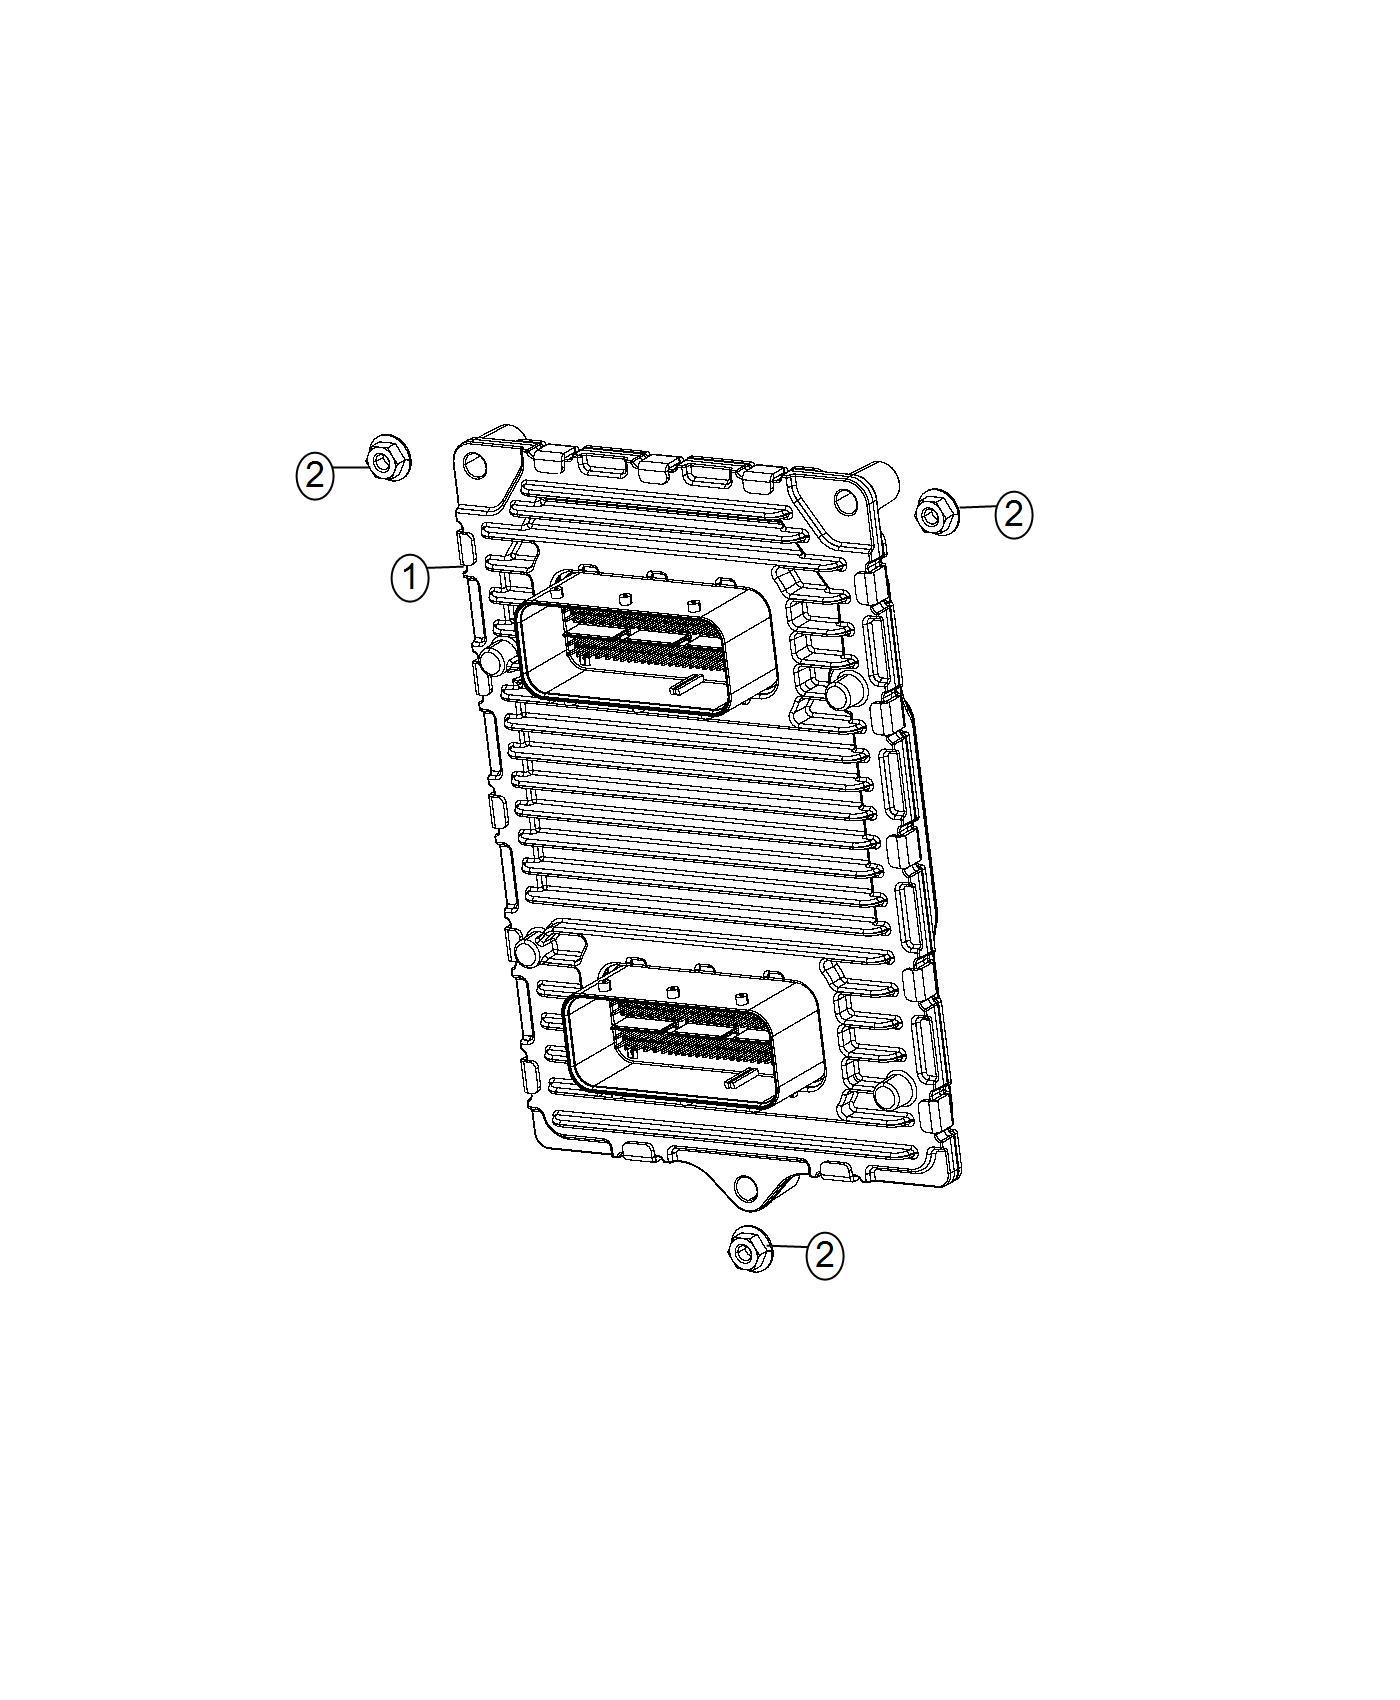 Jeep Compass Module. Engine controller. Mopar, modules